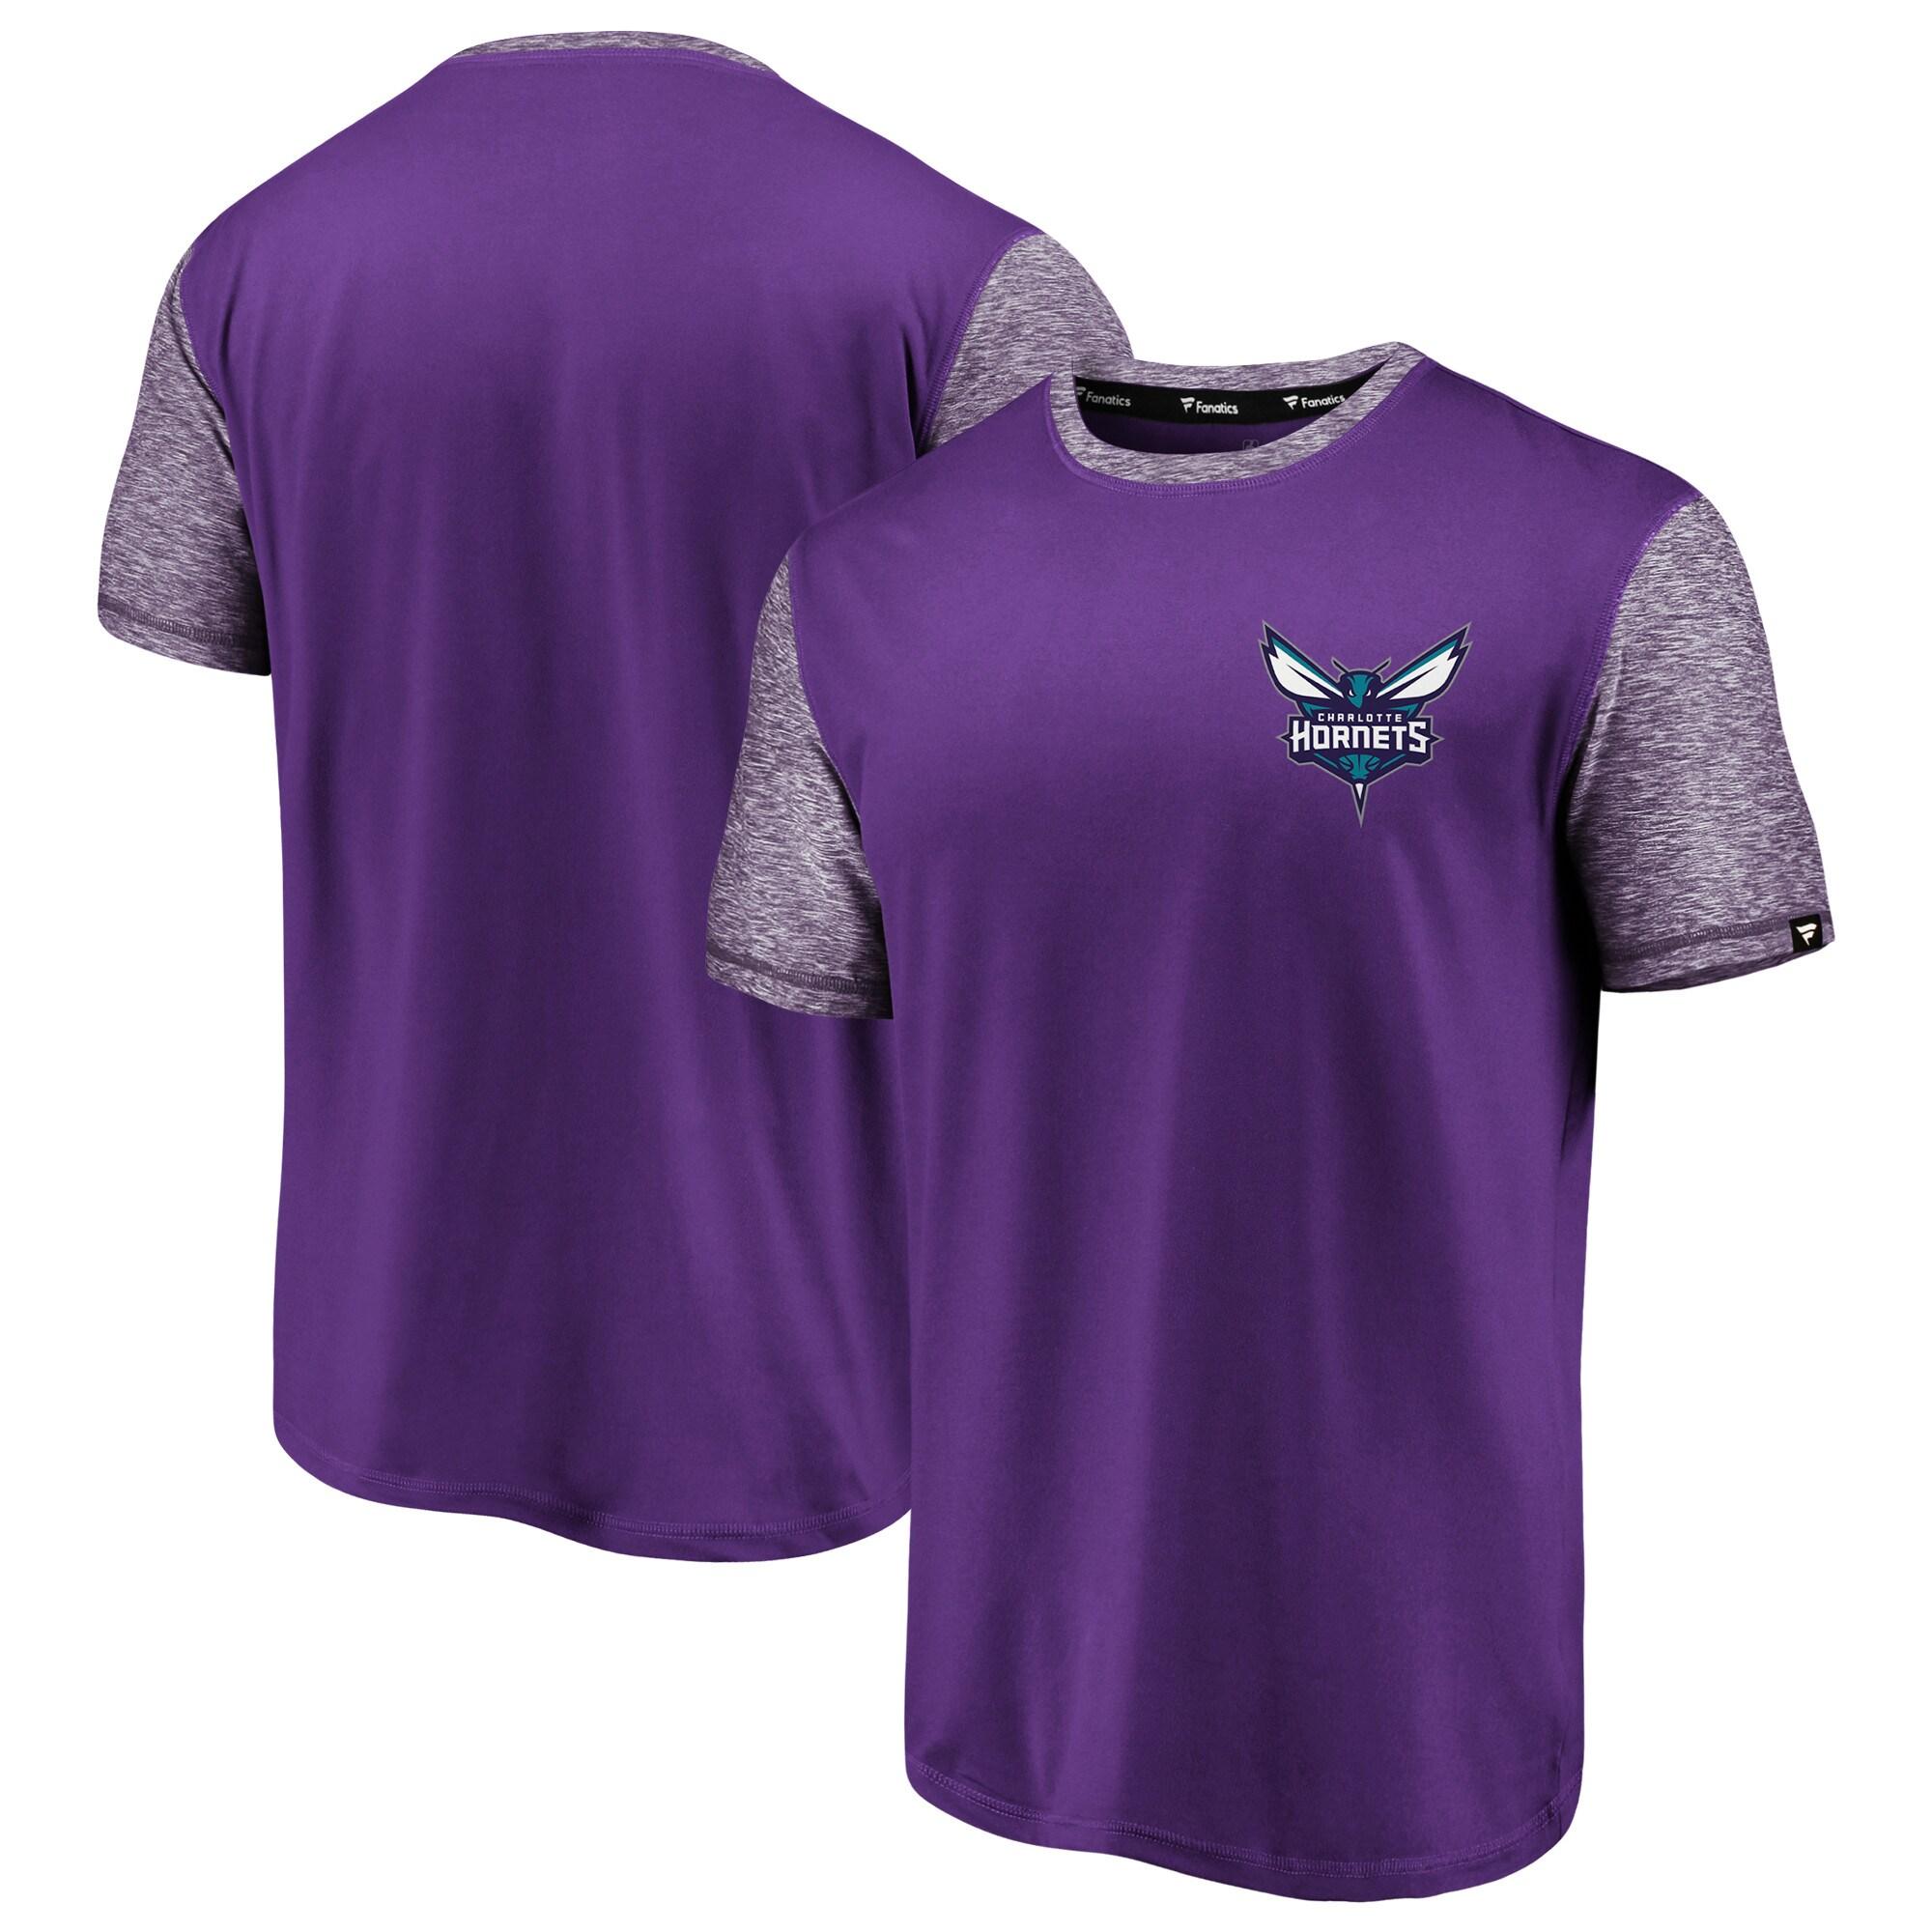 Charlotte Hornets Fanatics Branded Made to Move Static Performance T-Shirt - Purple/Heathered Purple